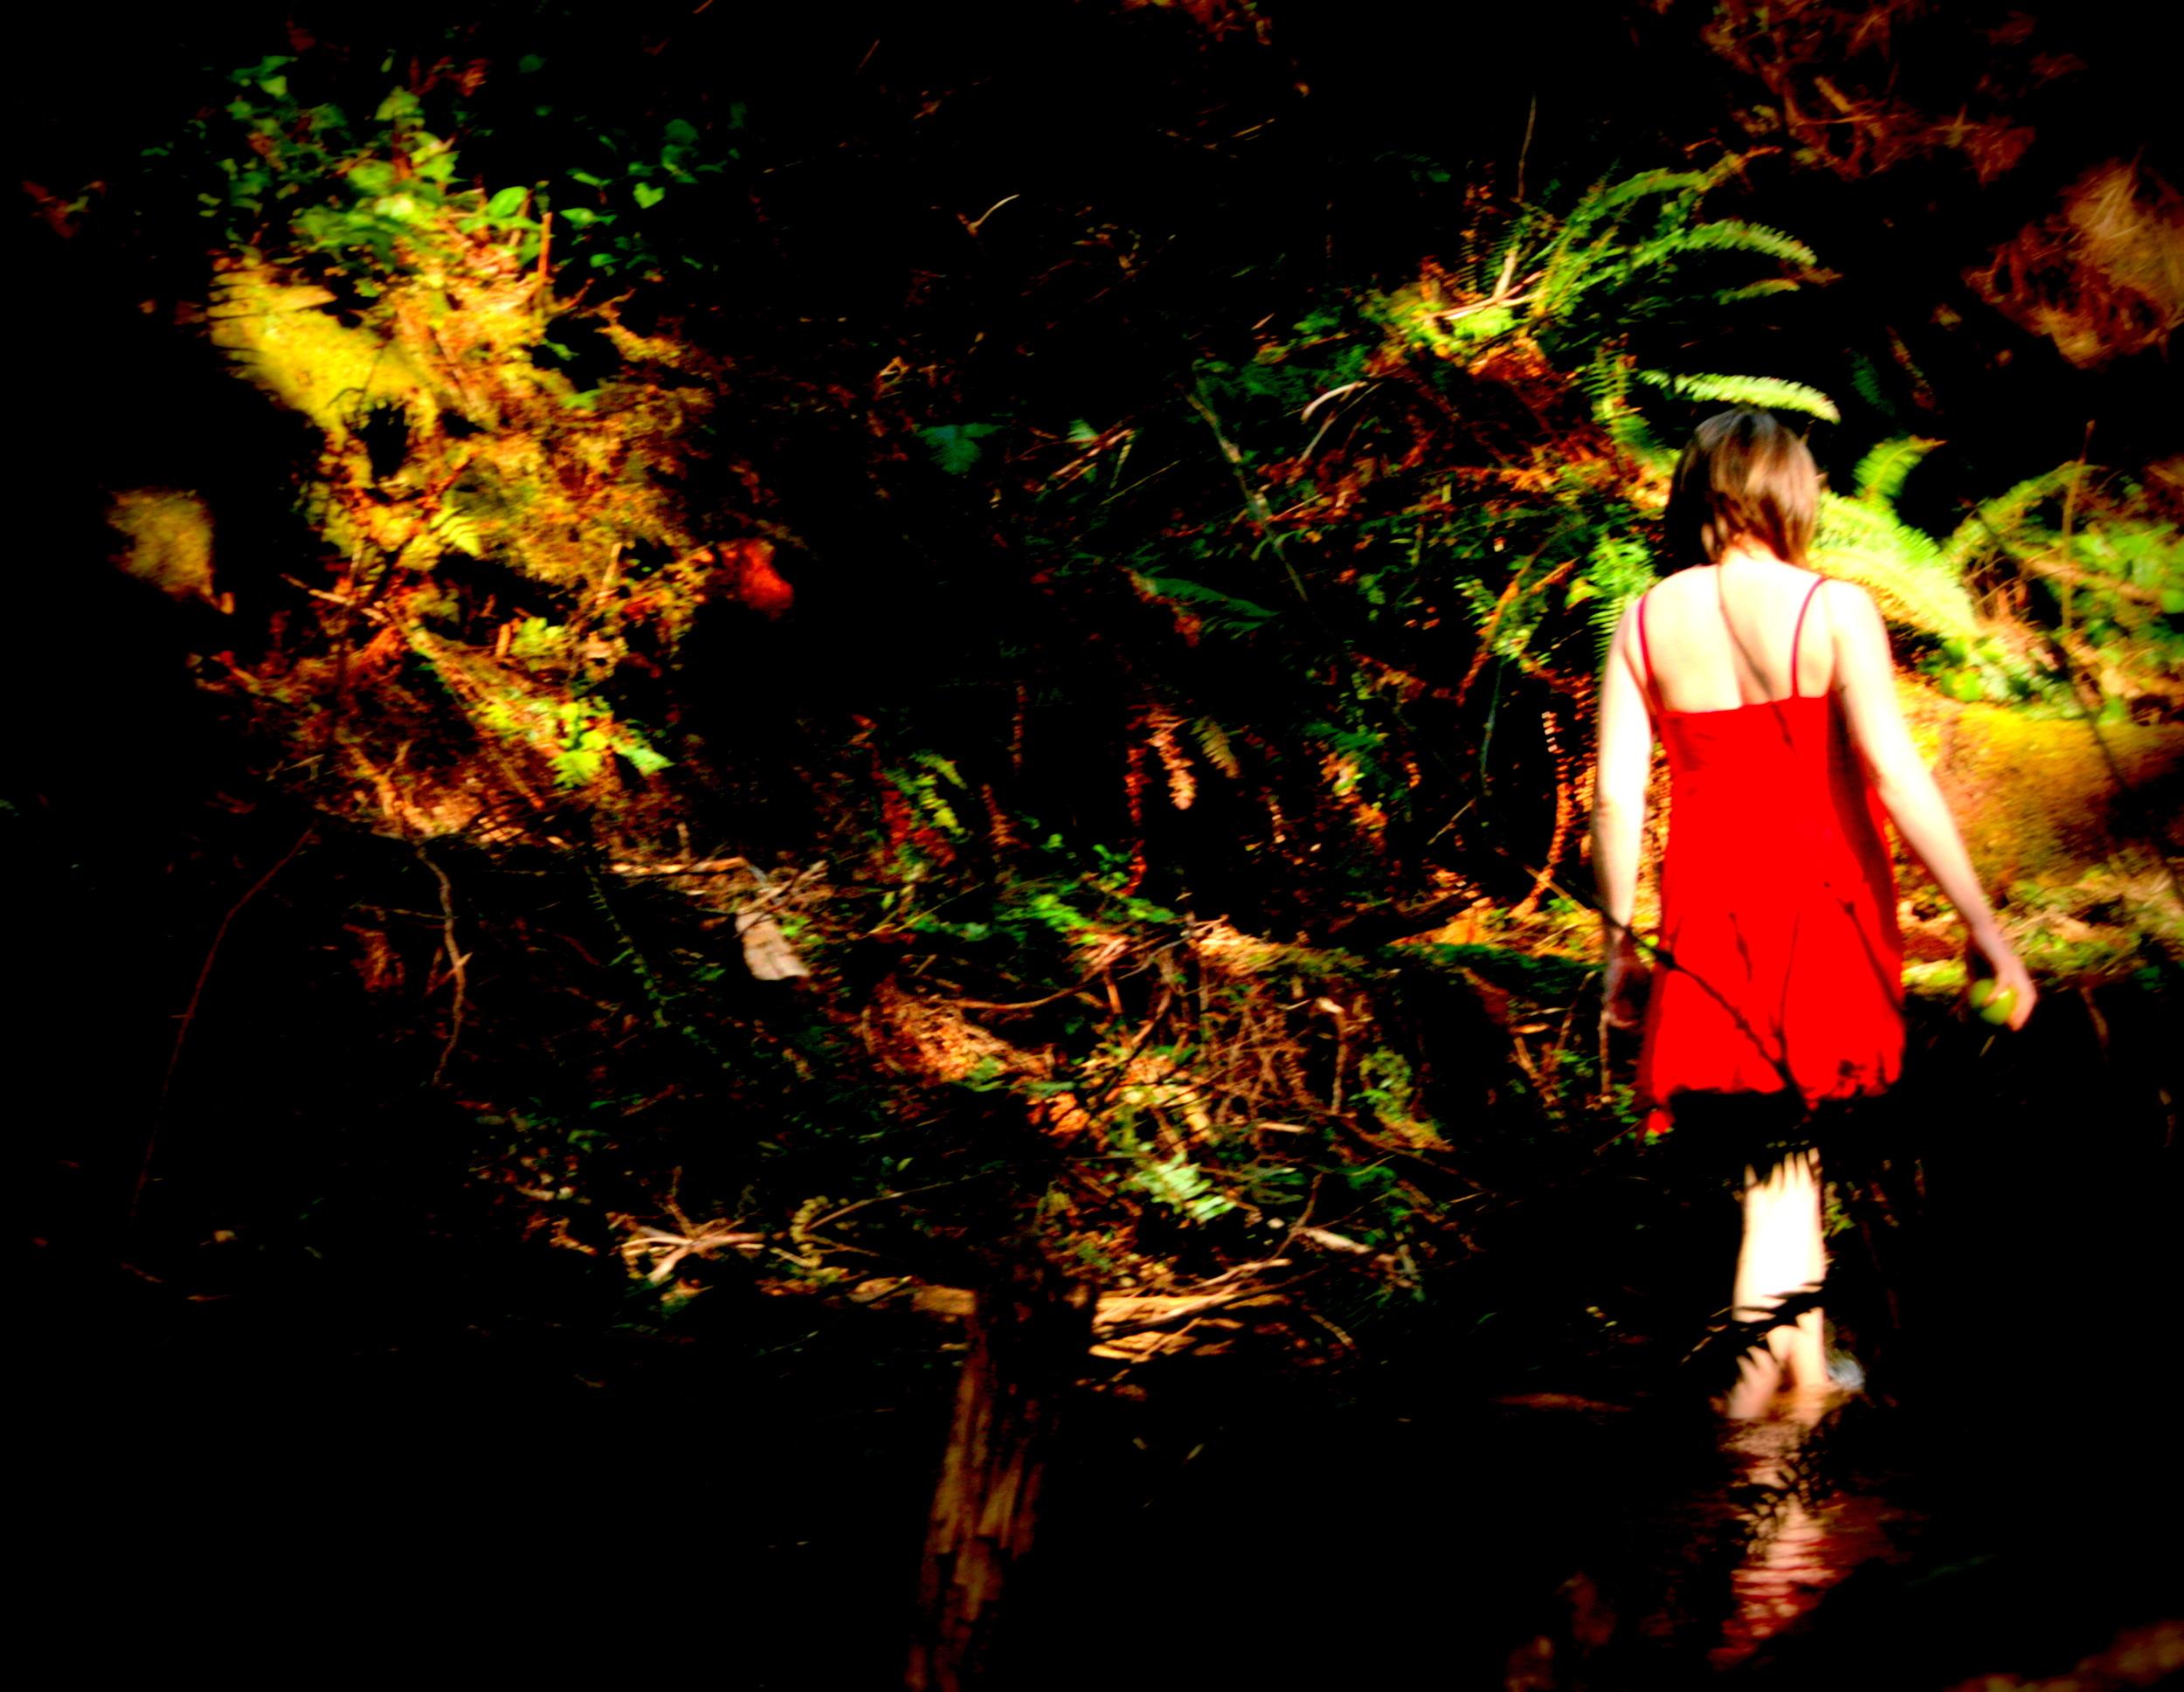 Strangled Darlings in the Garden of Eden